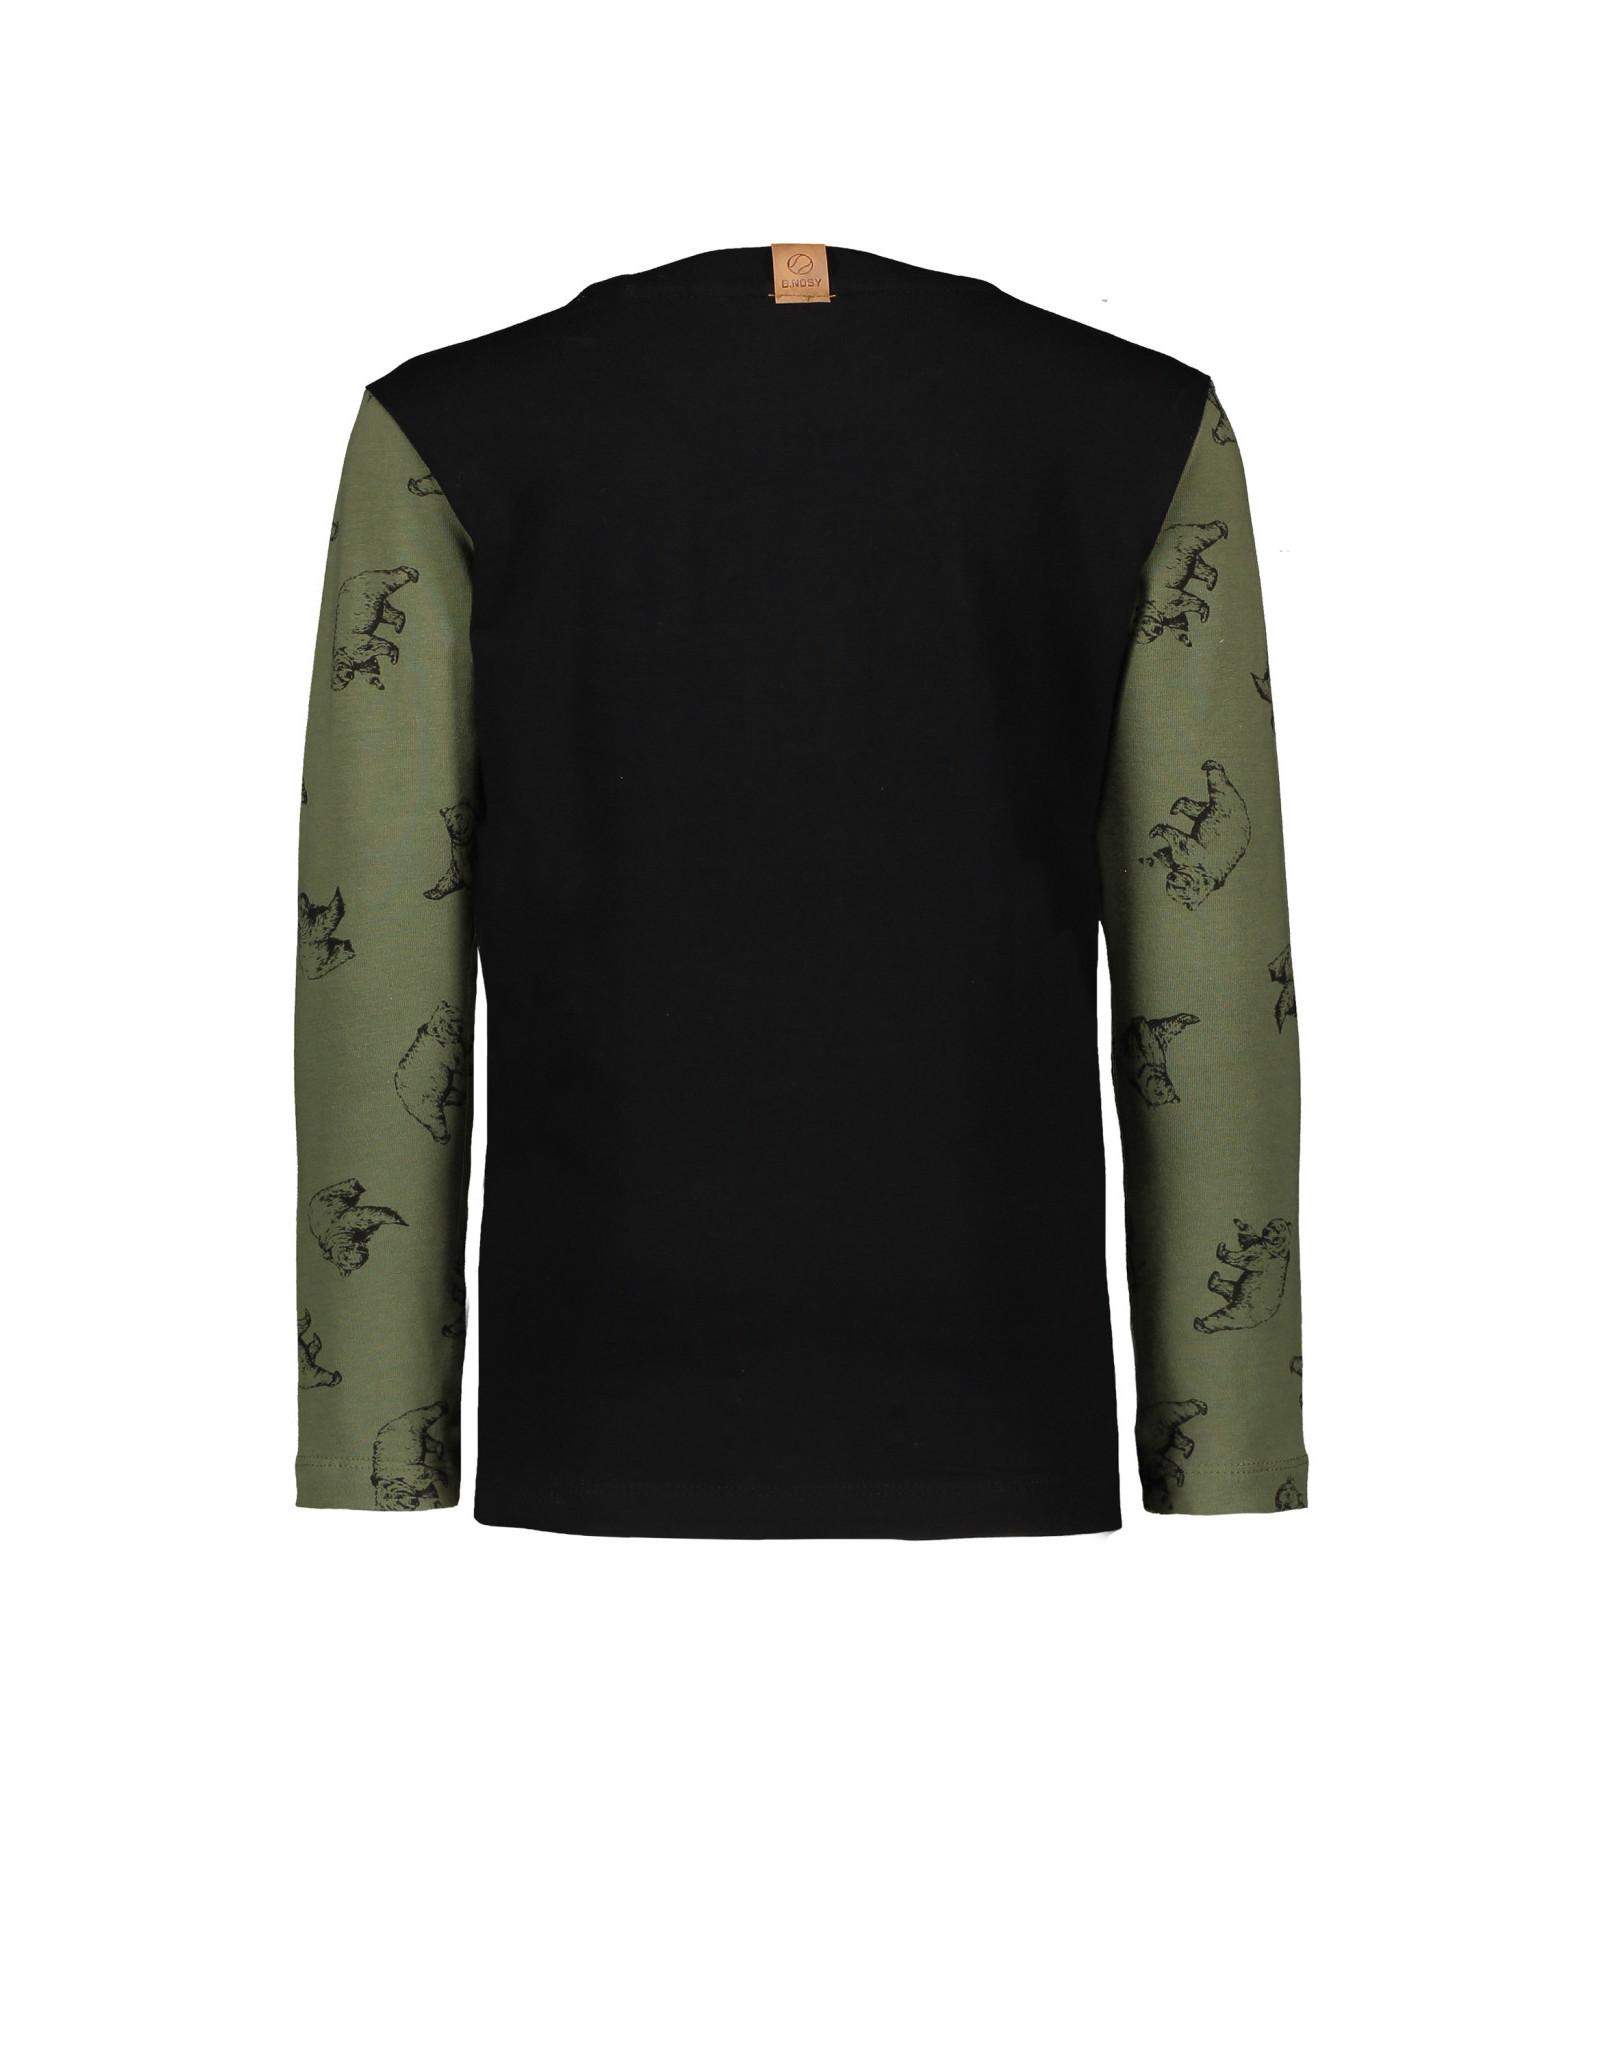 B-nosy Longsleeve cut and sew contrast AO 378 Bear leaf green